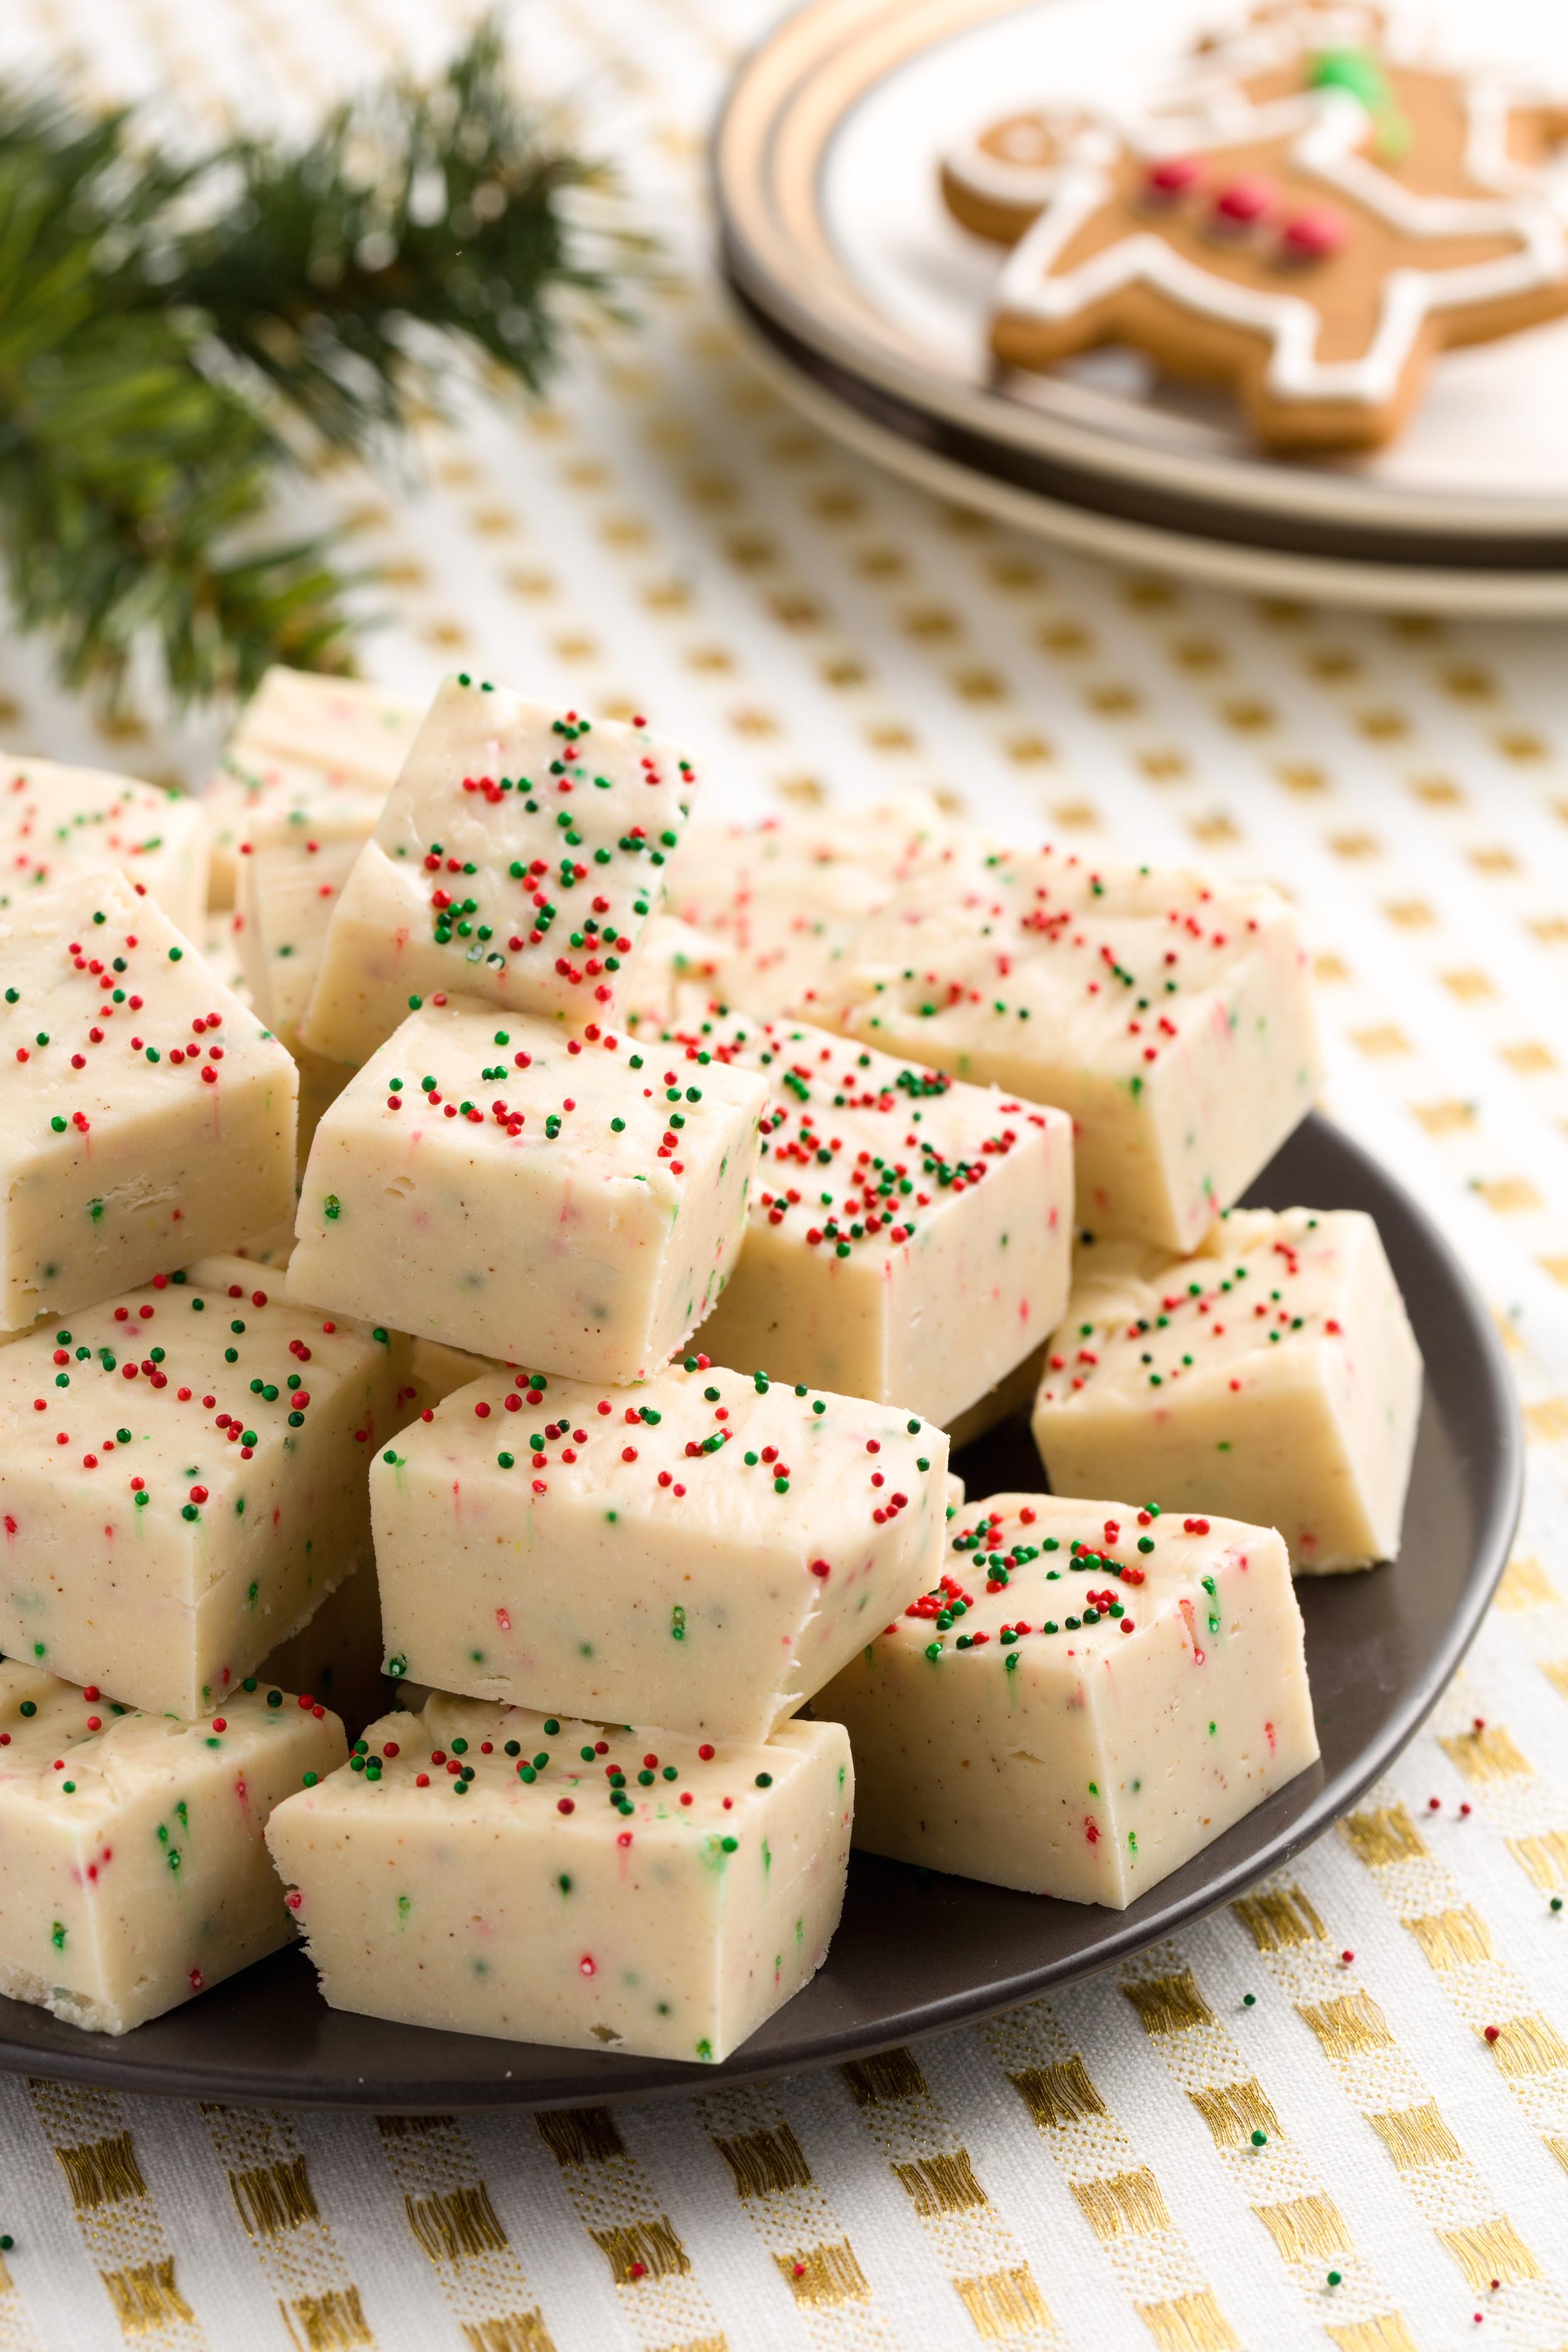 Recipes For Christmas Candy  18 Easy Homemade Christmas Candy Recipes How To Make